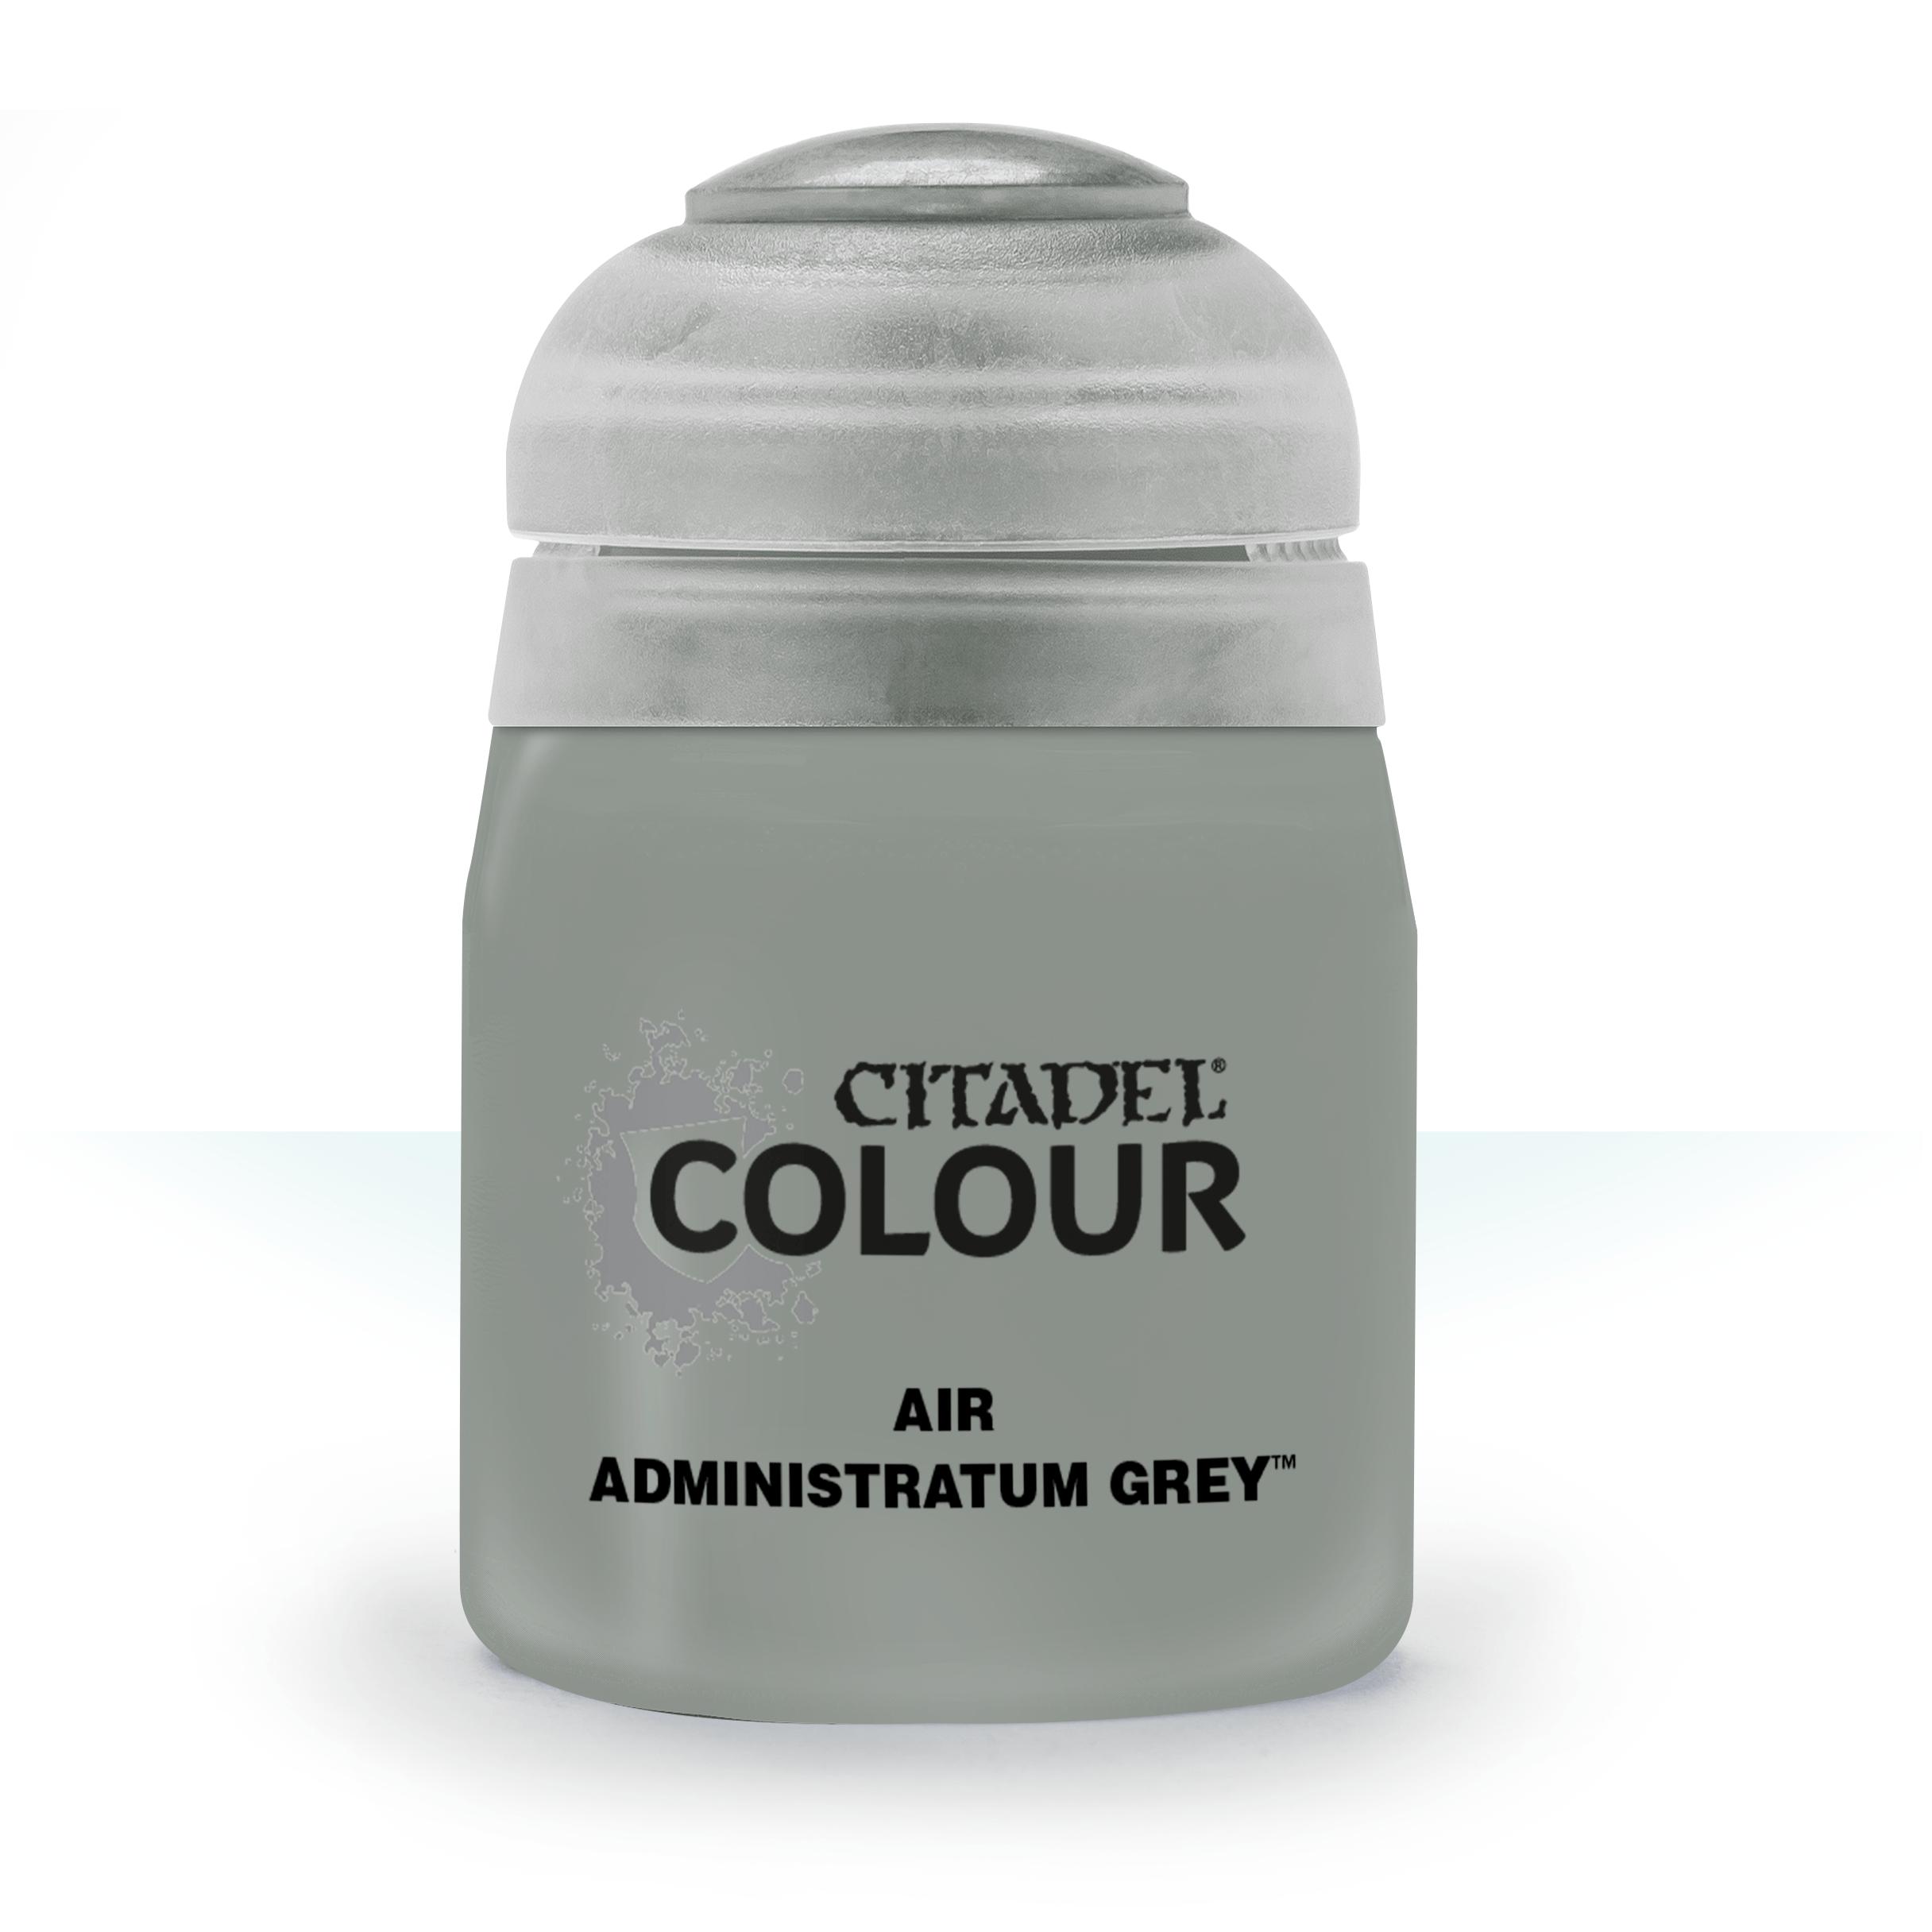 Administratum Grey, Citadel Air 24ml